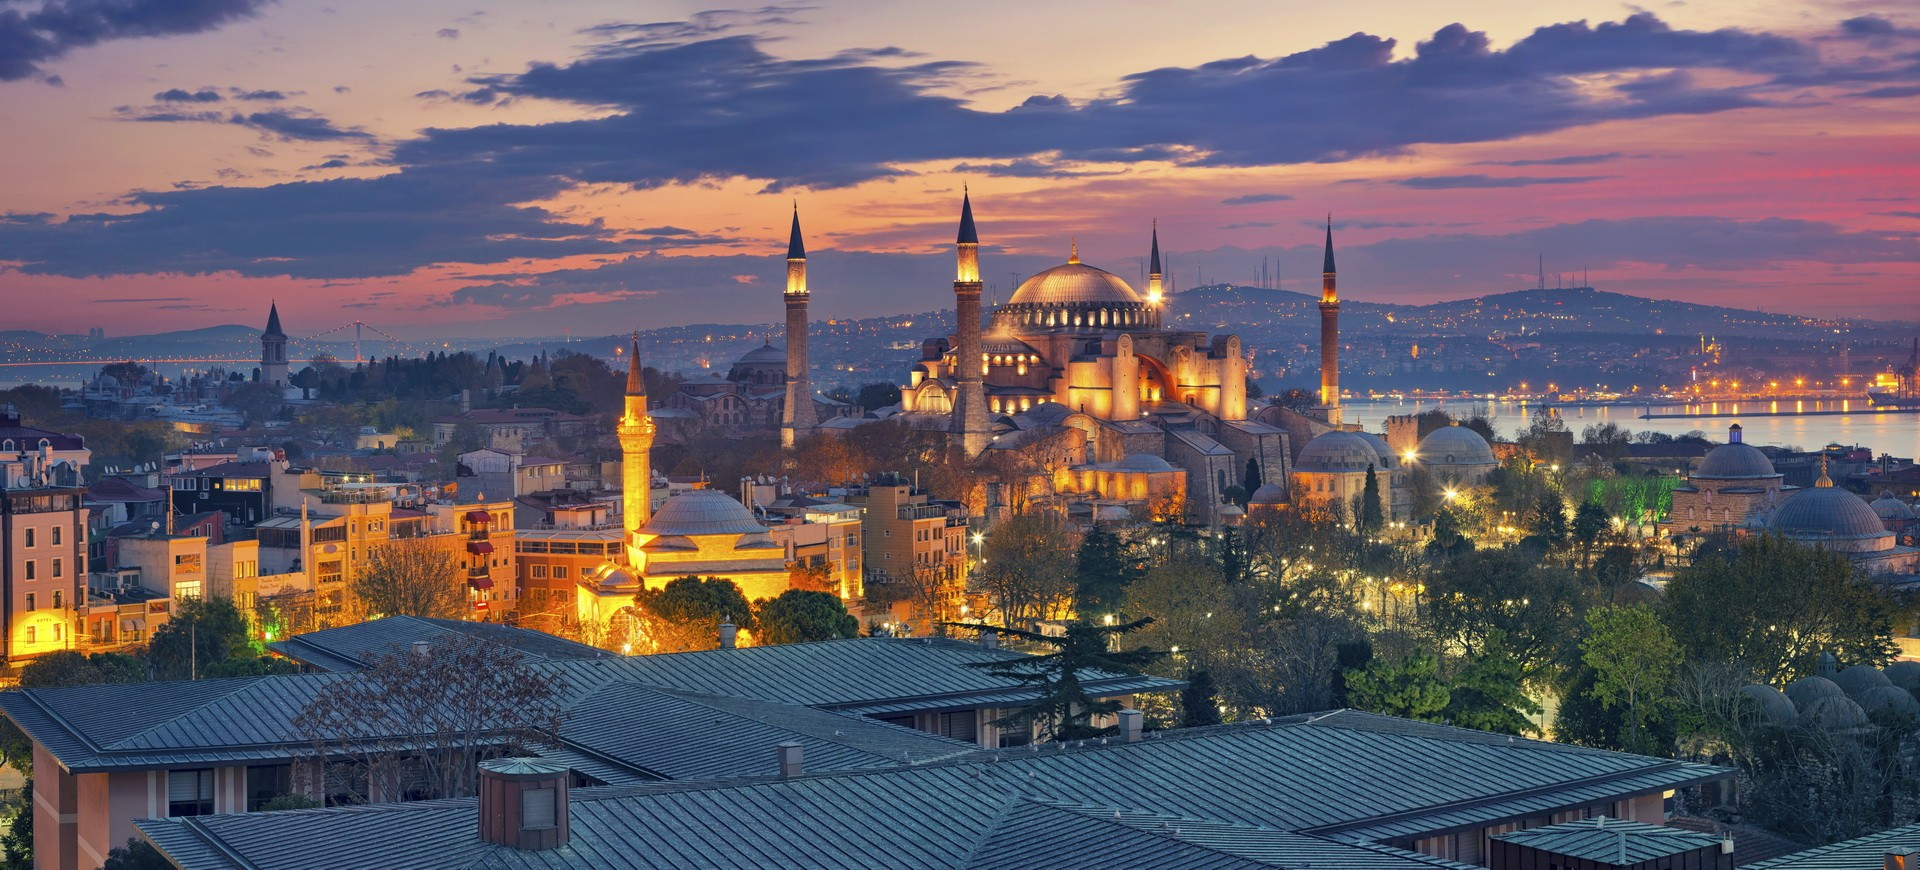 Turquie Istanbul Sainte Sophie by night